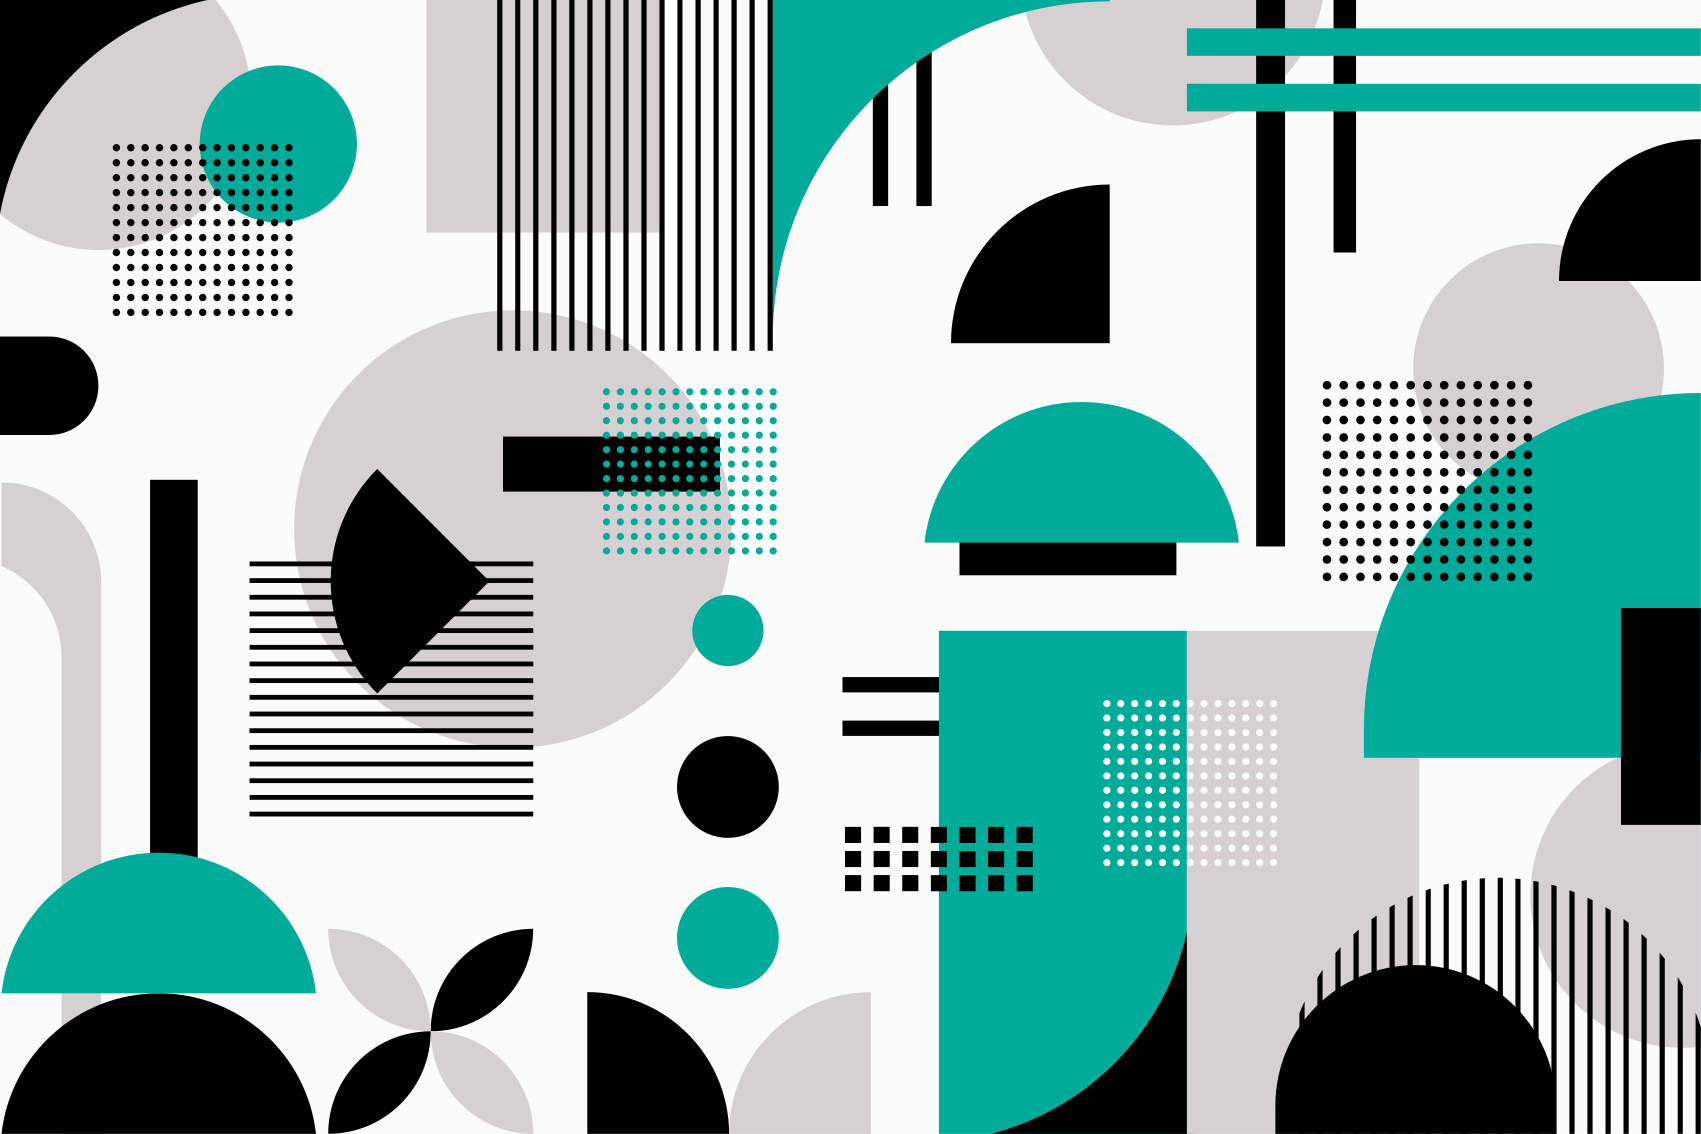 TENSTICKERS. モダンな幾何学的形状のビニールラグ. さまざまな抽象的な形のパターンがすべて重なり合って交差していることを特徴とする幾何学的なビニールの敷物。サイズをお選びください。